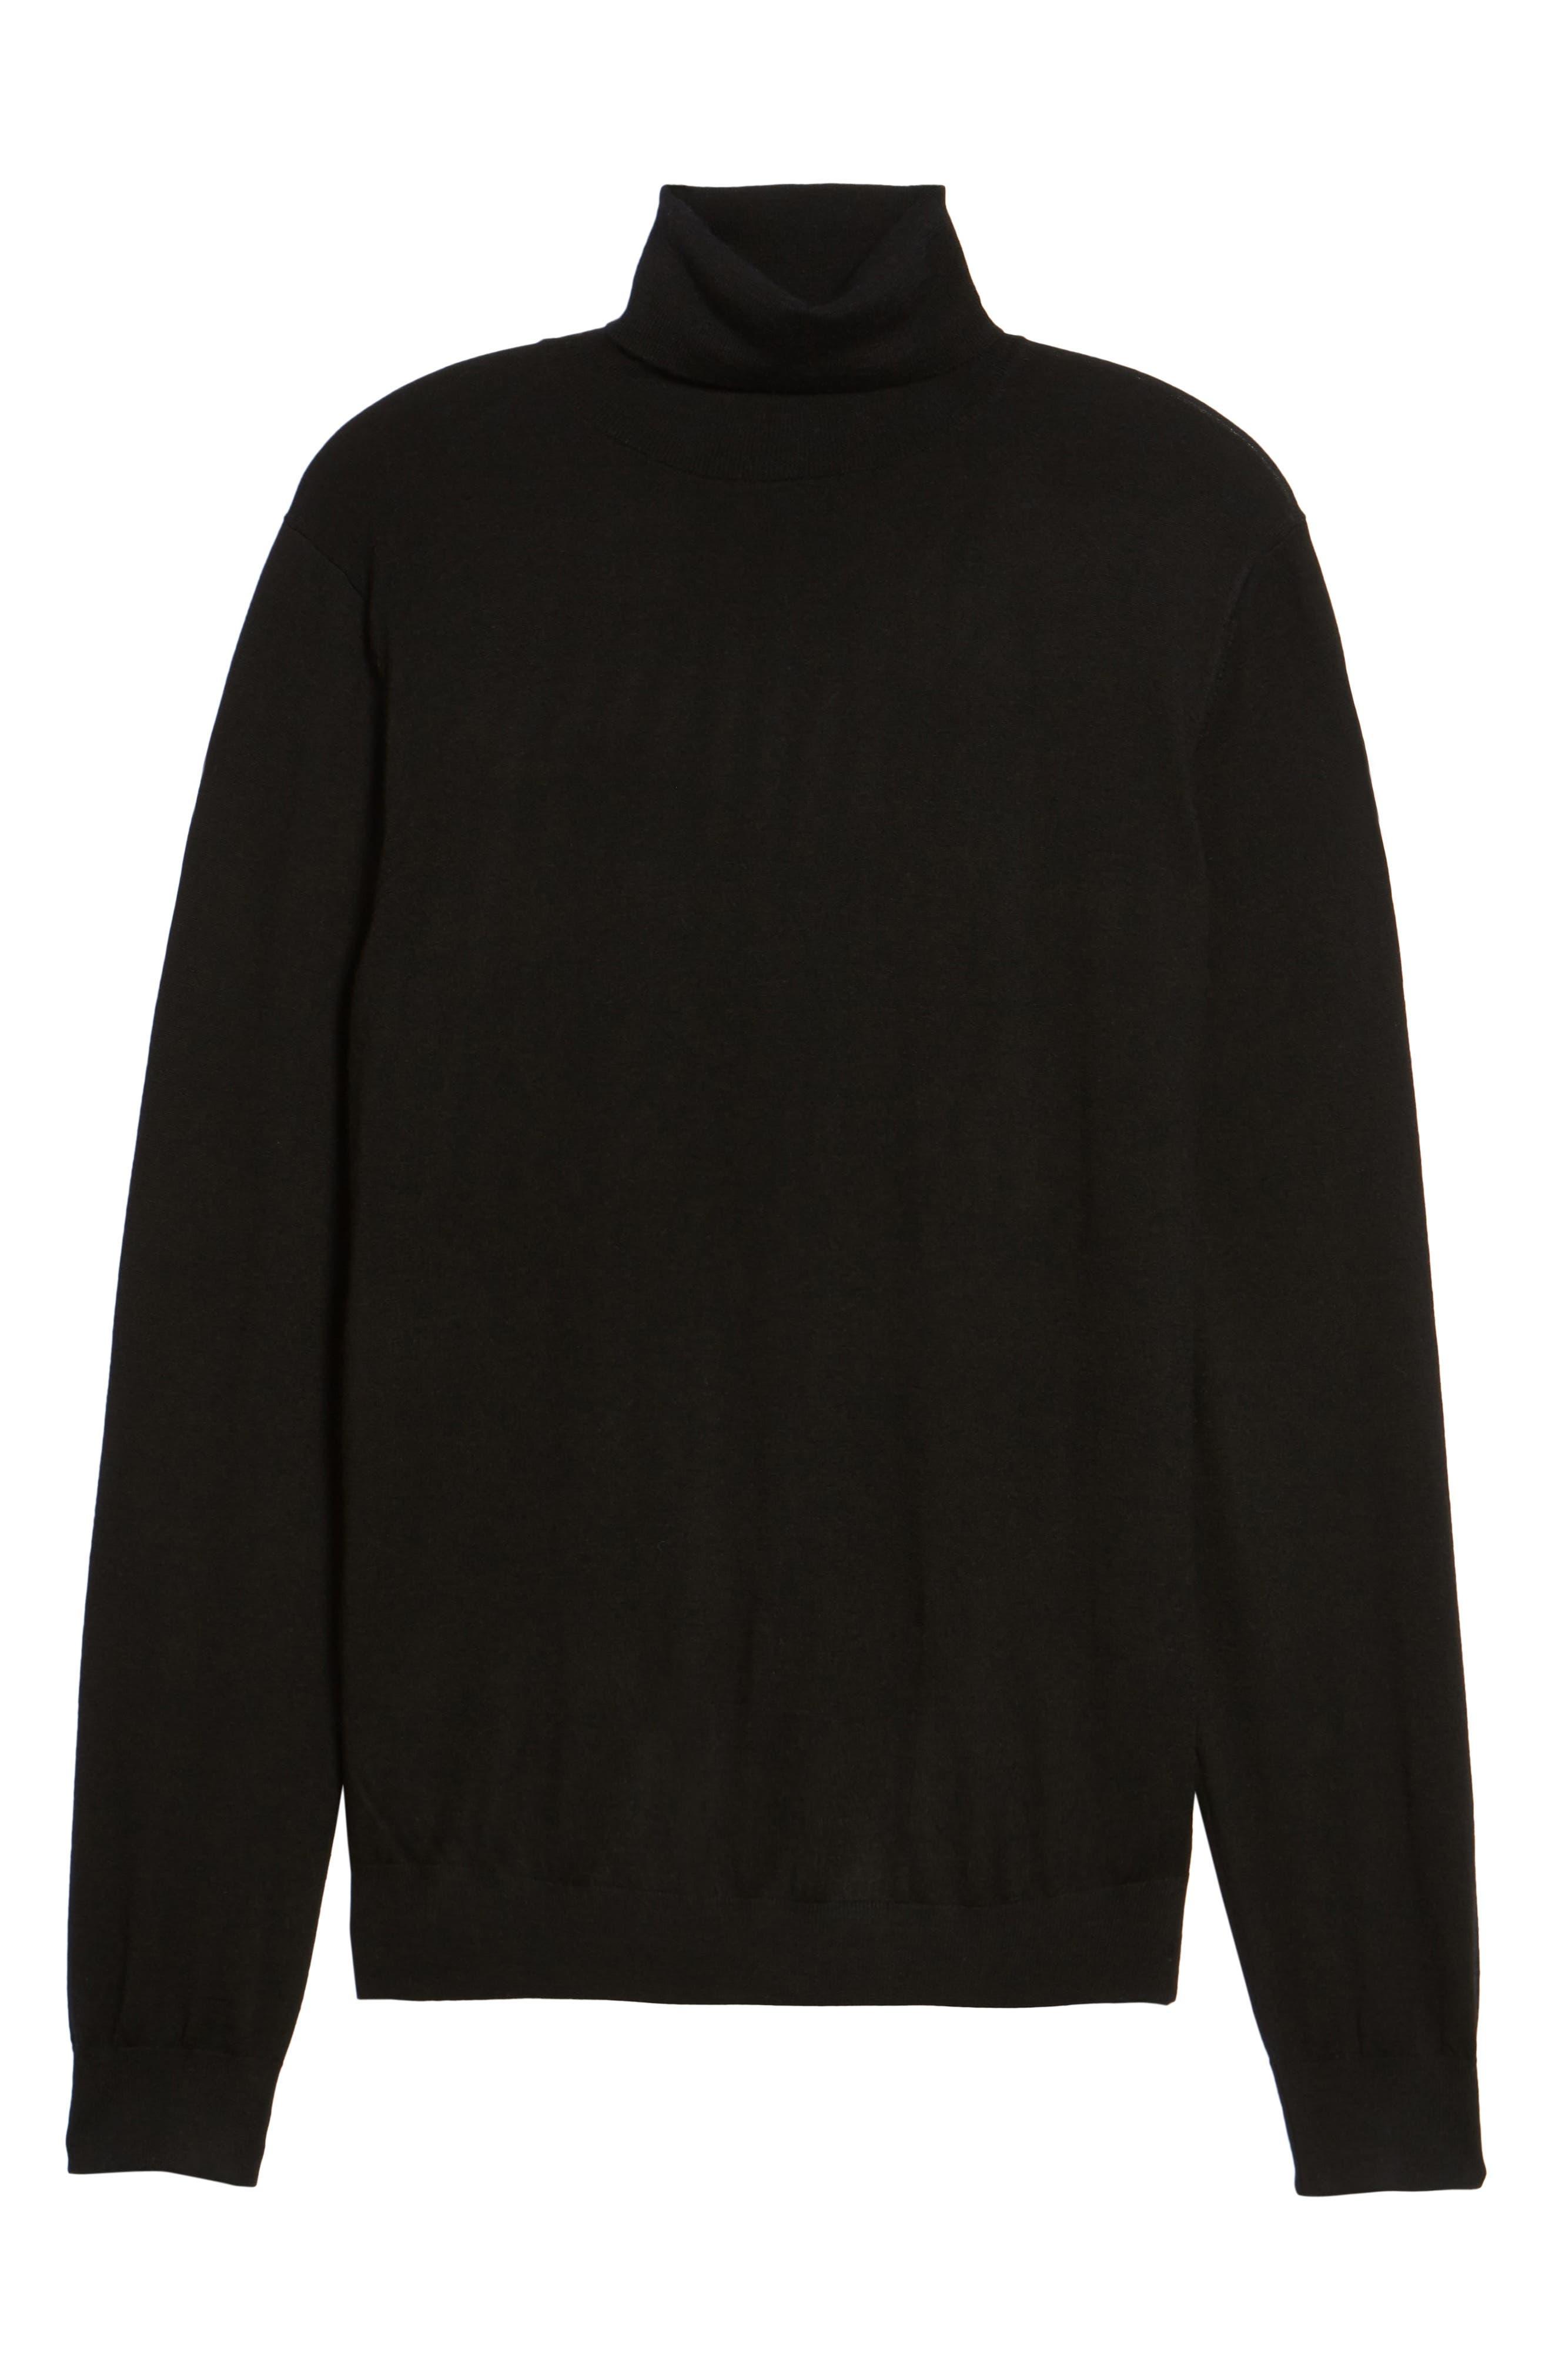 Turtleneck Sweater,                             Alternate thumbnail 6, color,                             001